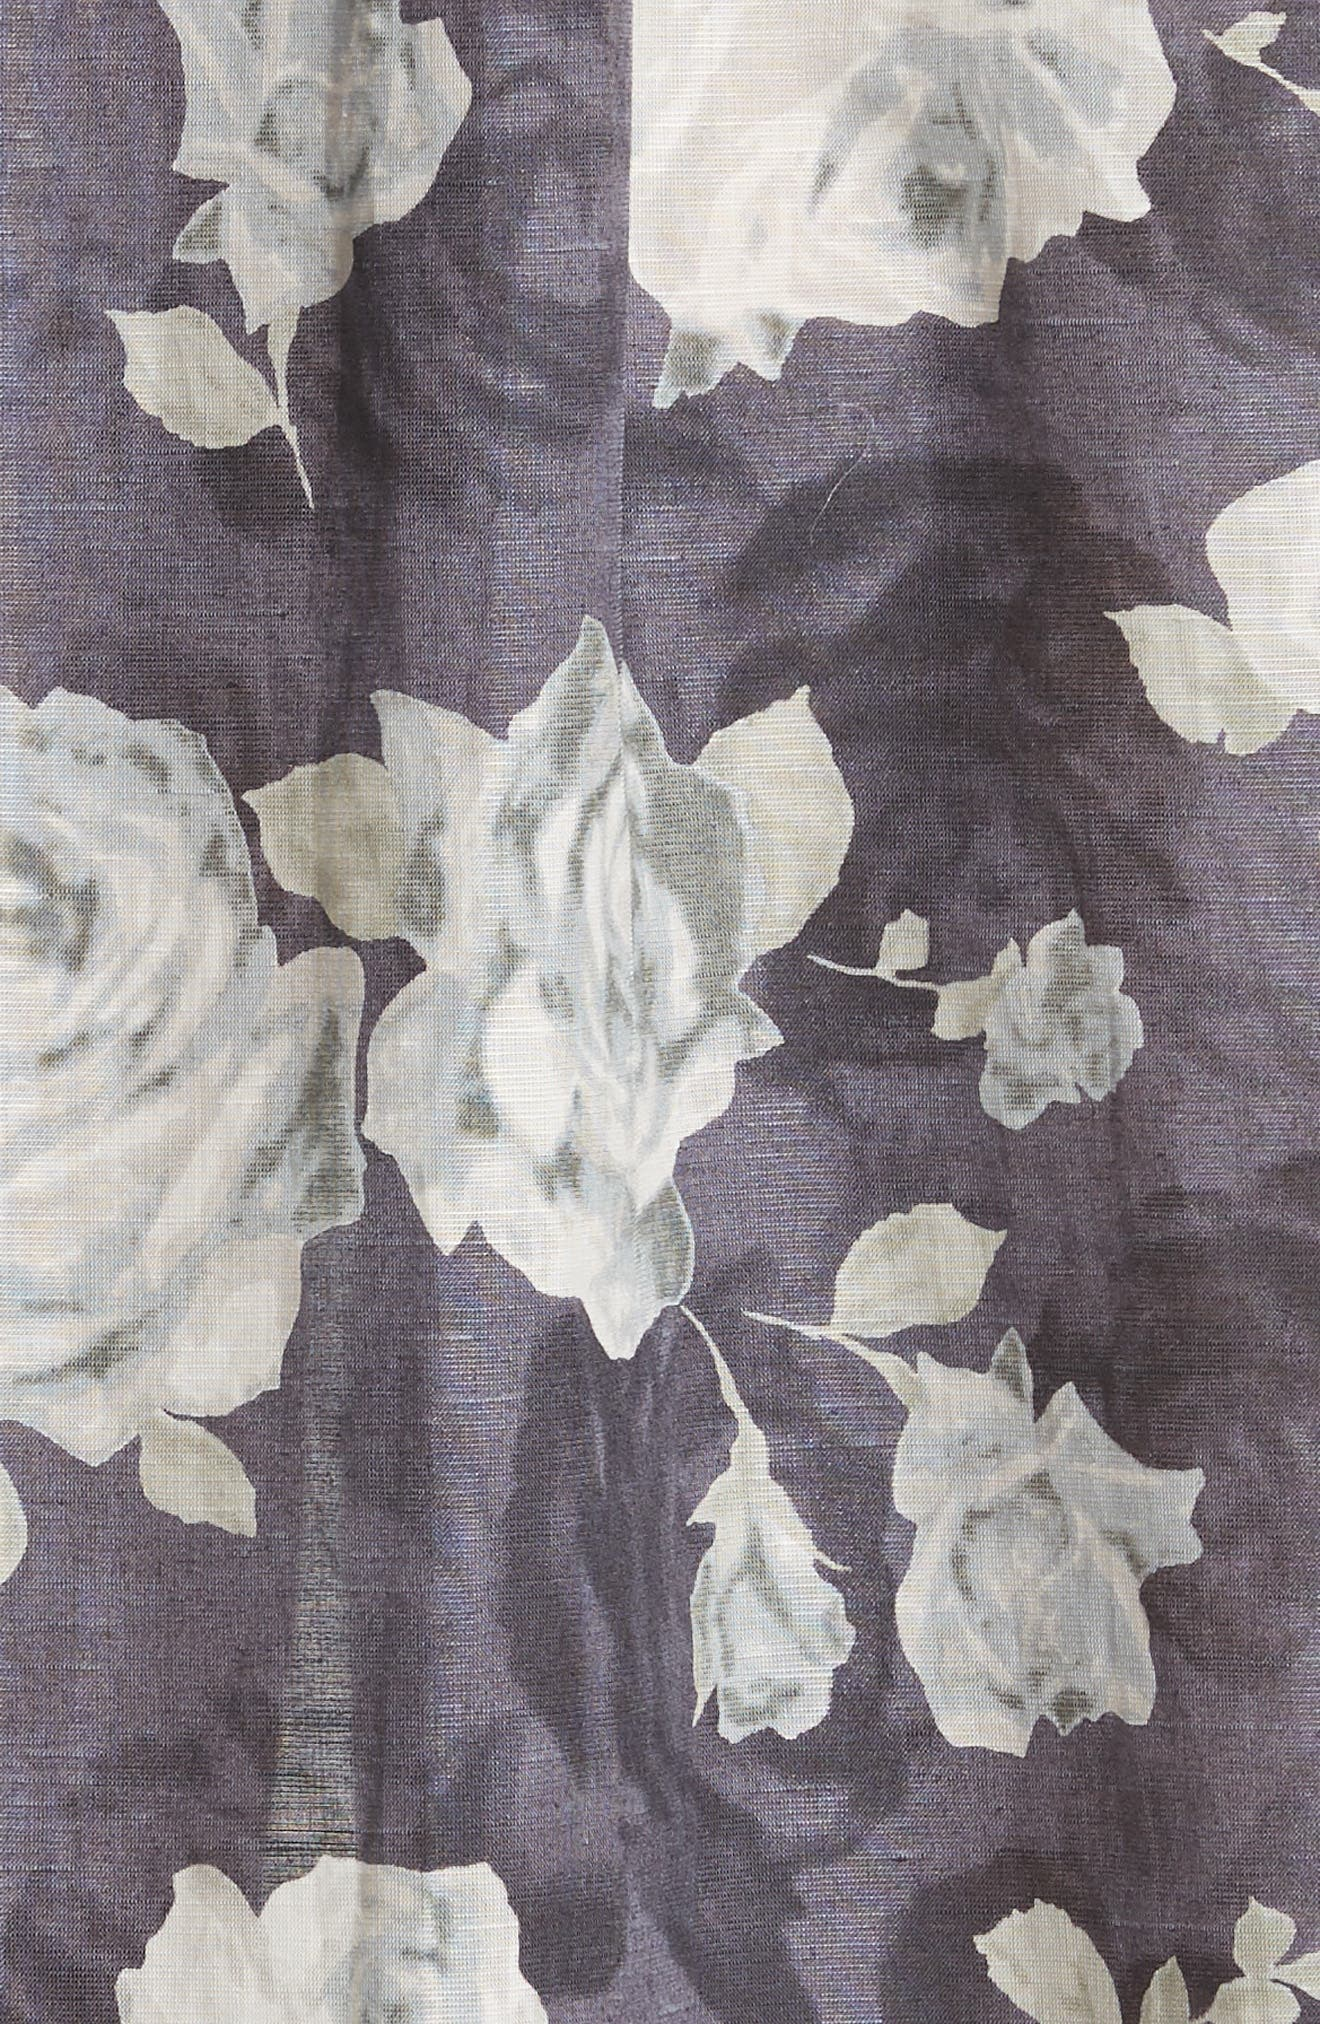 Rose Print Dress,                             Alternate thumbnail 6, color,                             Charcoal X Black